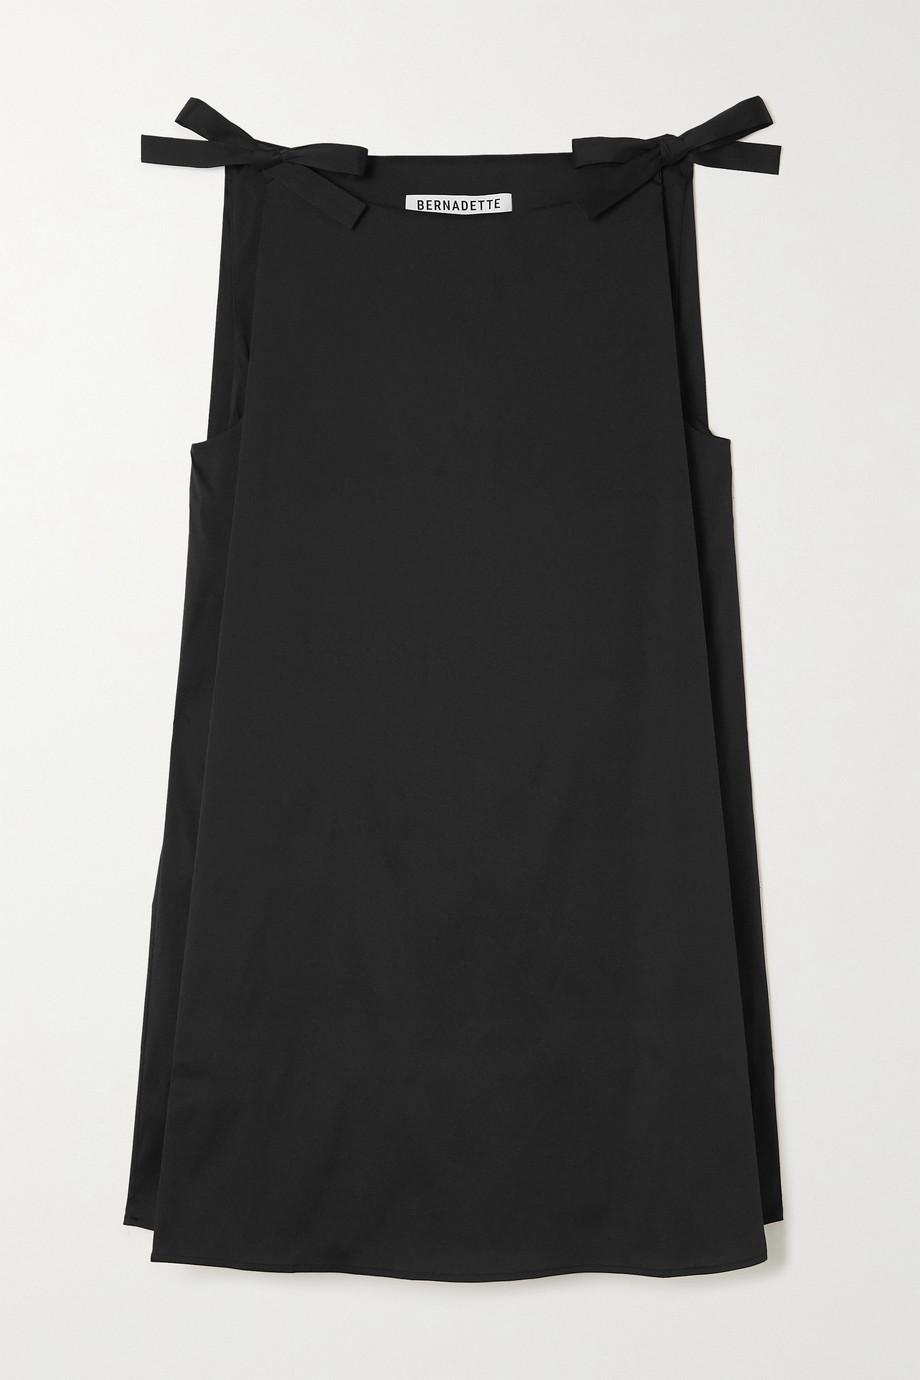 BERNADETTE Mary tie-detailed woven mini dress